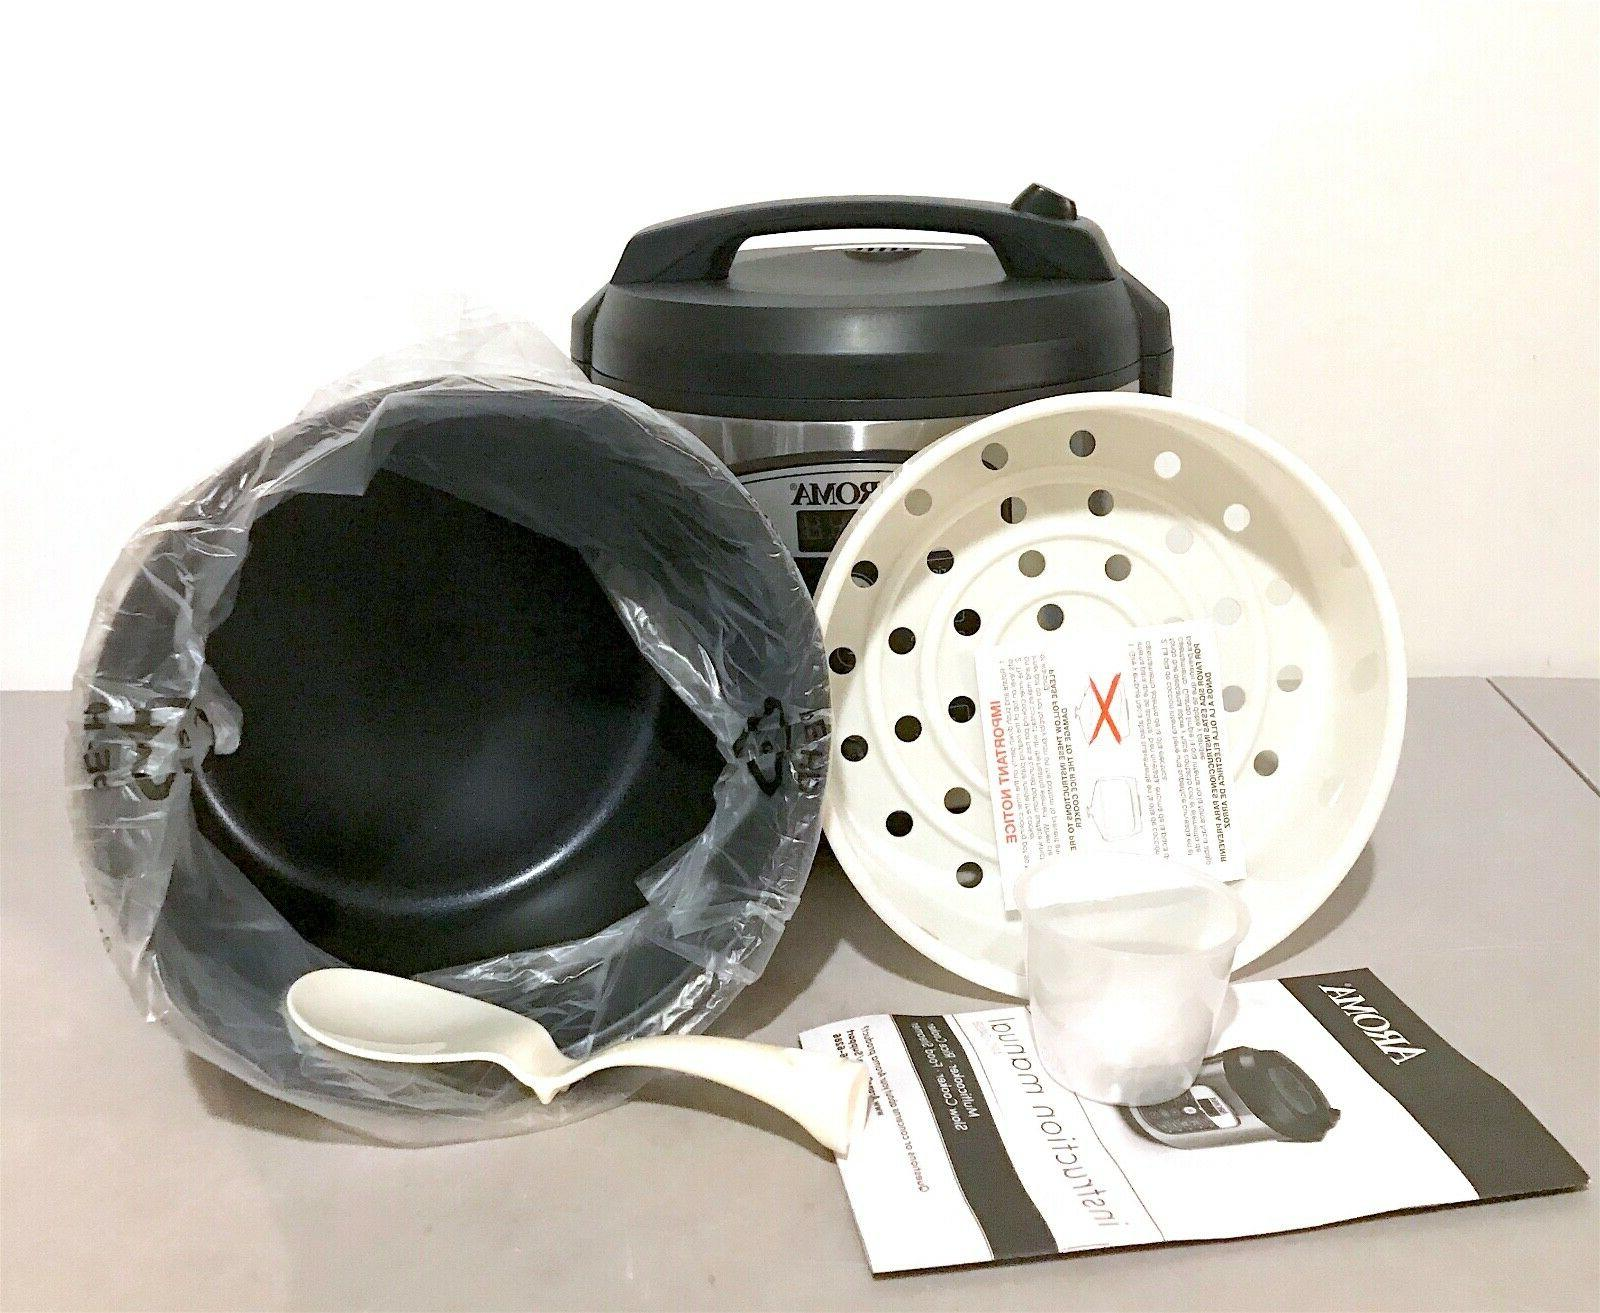 AROMA 20 Cup 5 Quart Rice Steamer - Black/Stainless Steel ARC-1040SB